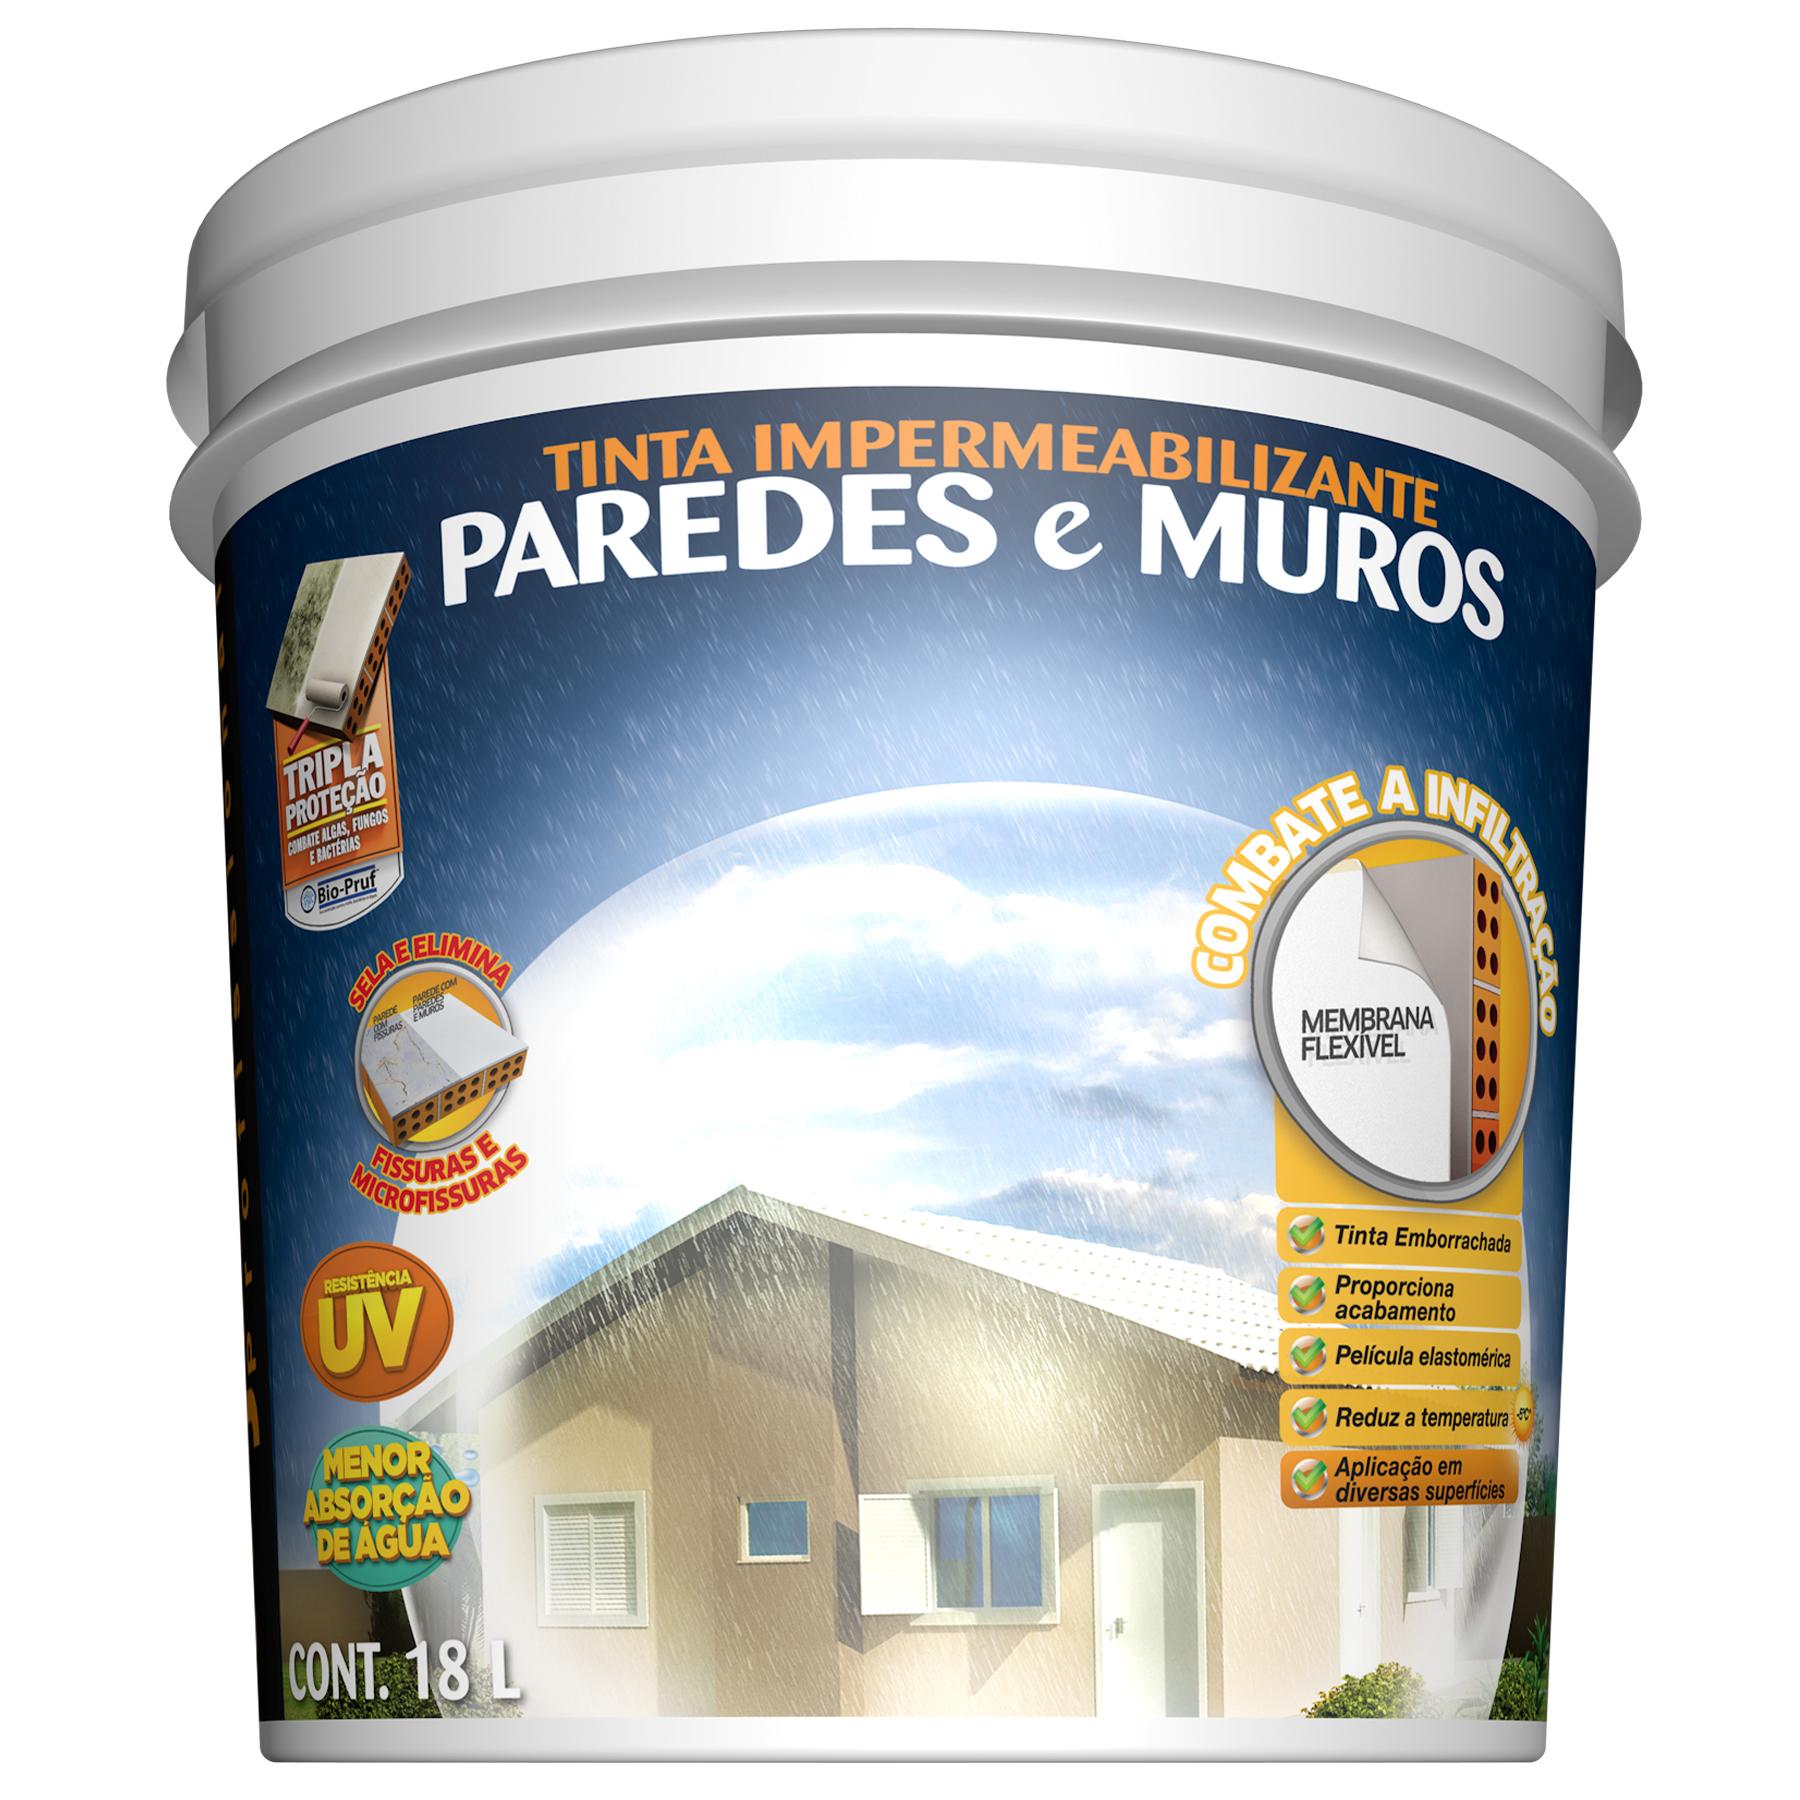 Tinta impermeabilizante paredes e muros 18l branco - Impermeabilizante para paredes ...